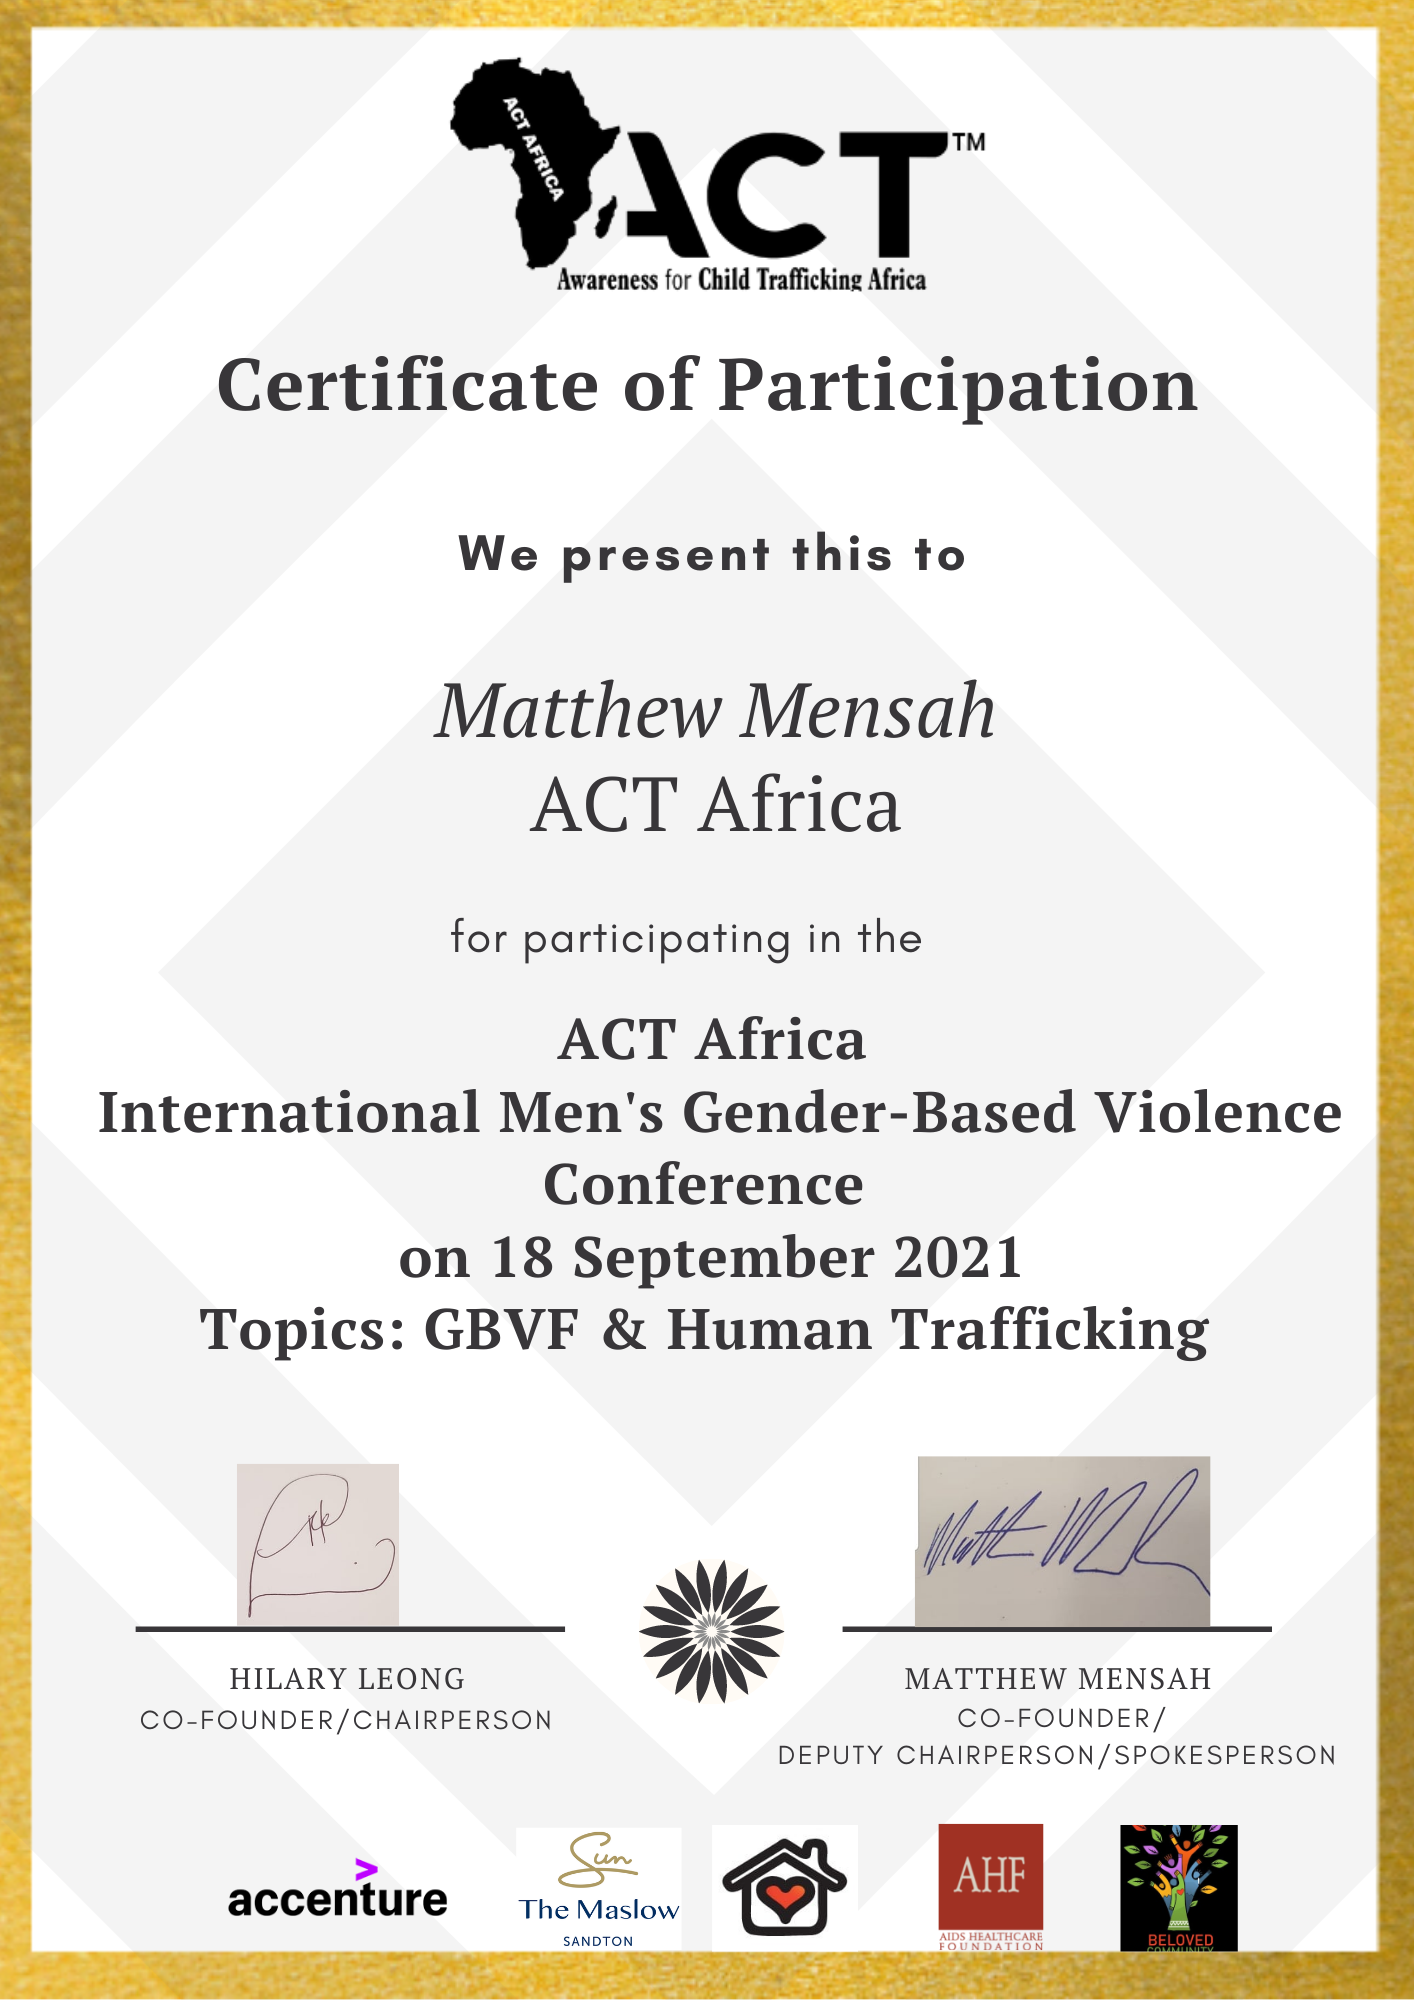 ACT Africa International Men's GBVF Certificate of Participation - Matthew Mensah